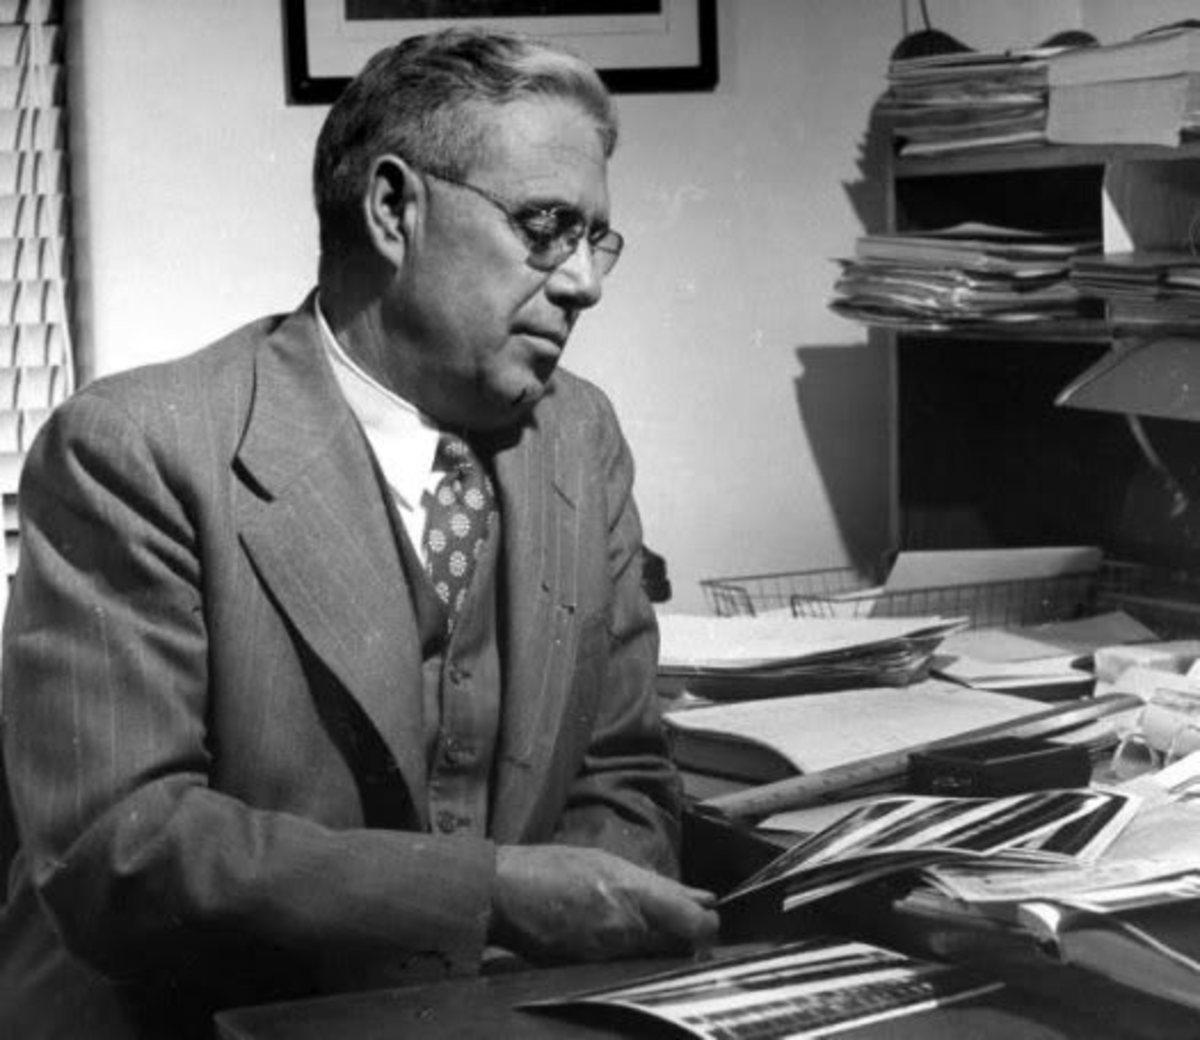 Milton Humason: The Man Behind the Hubble Law